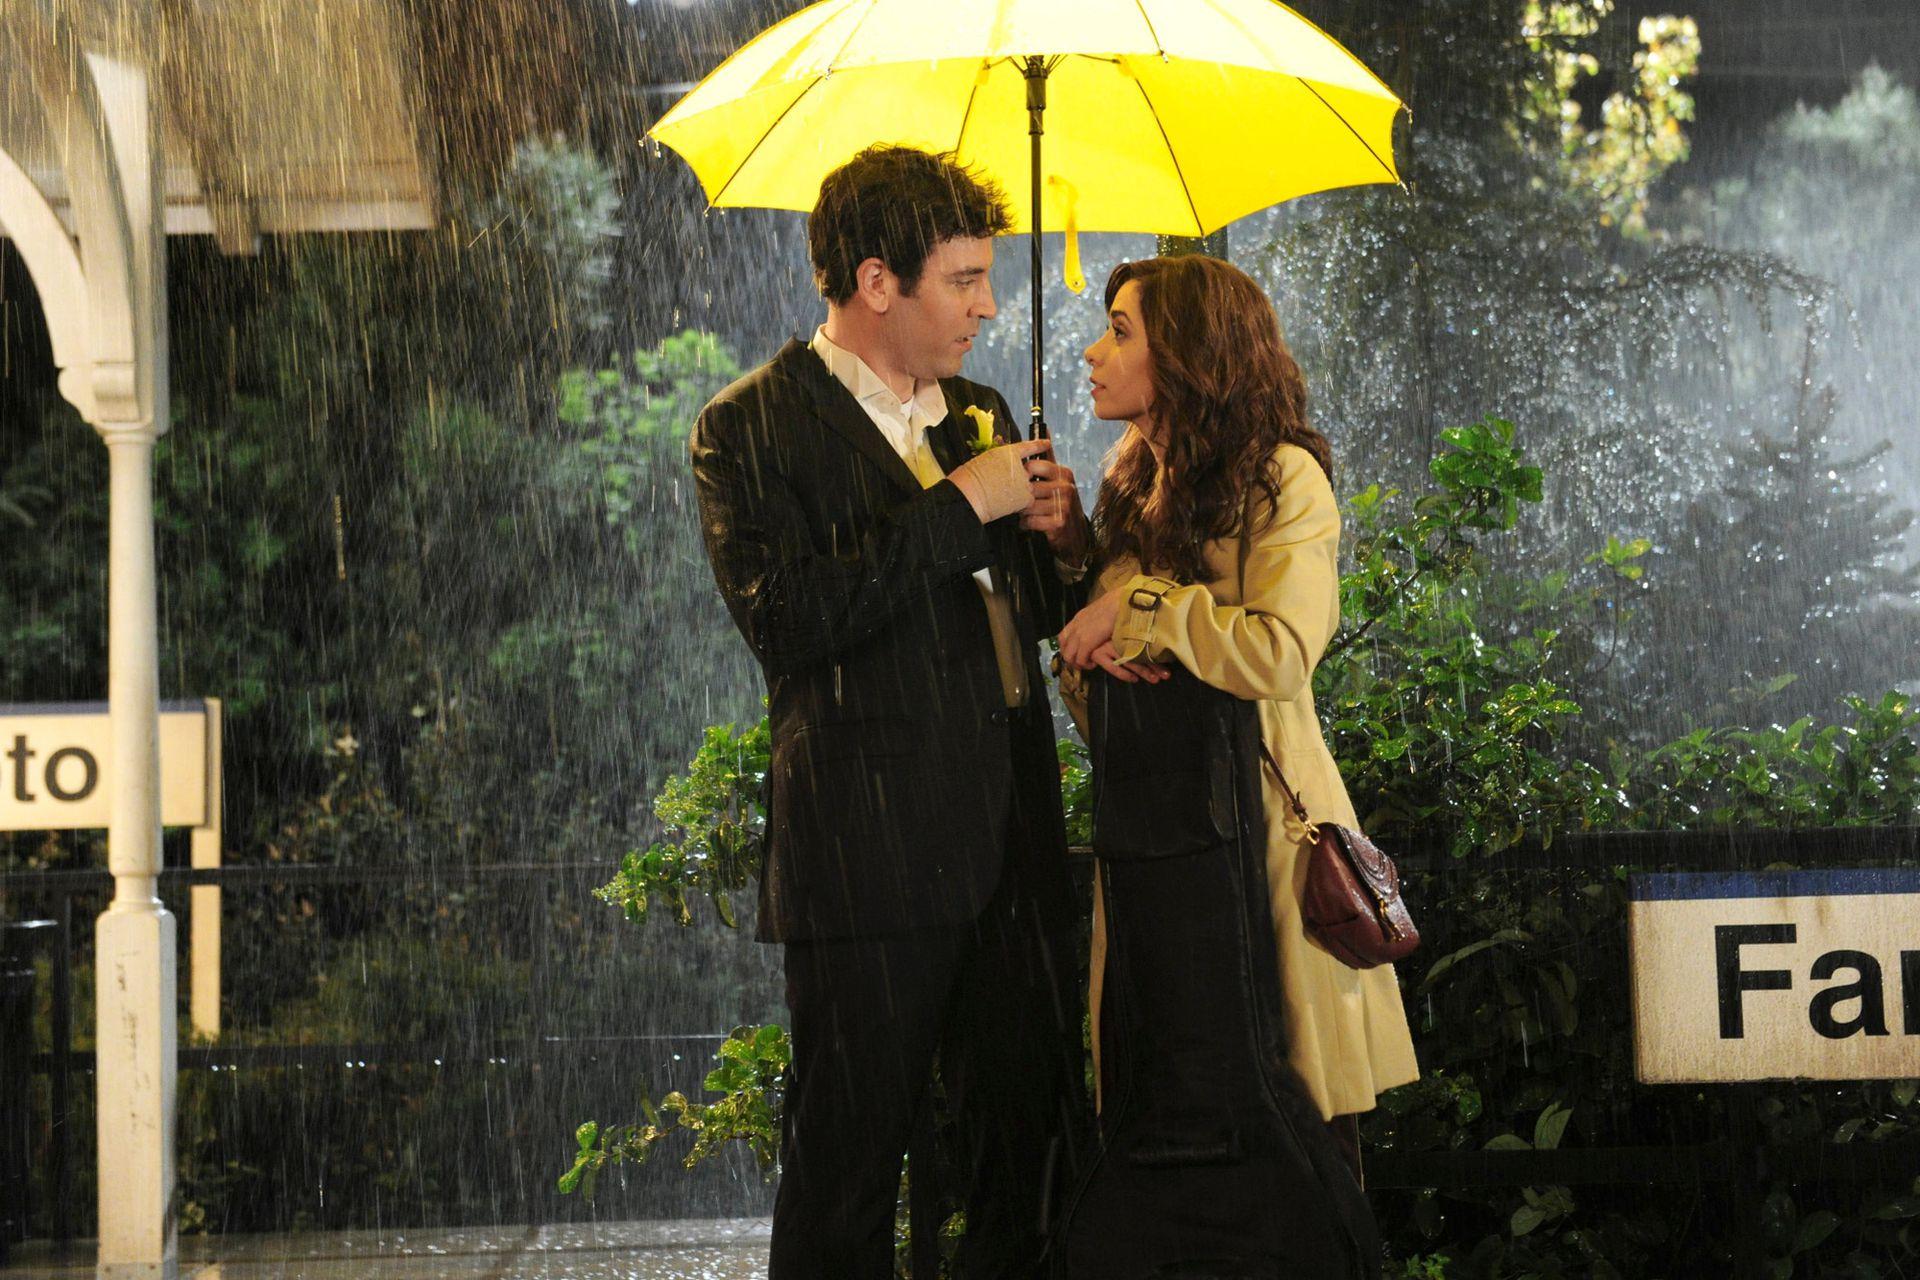 How I Met Your Mother y el famoso paraguas amarillo